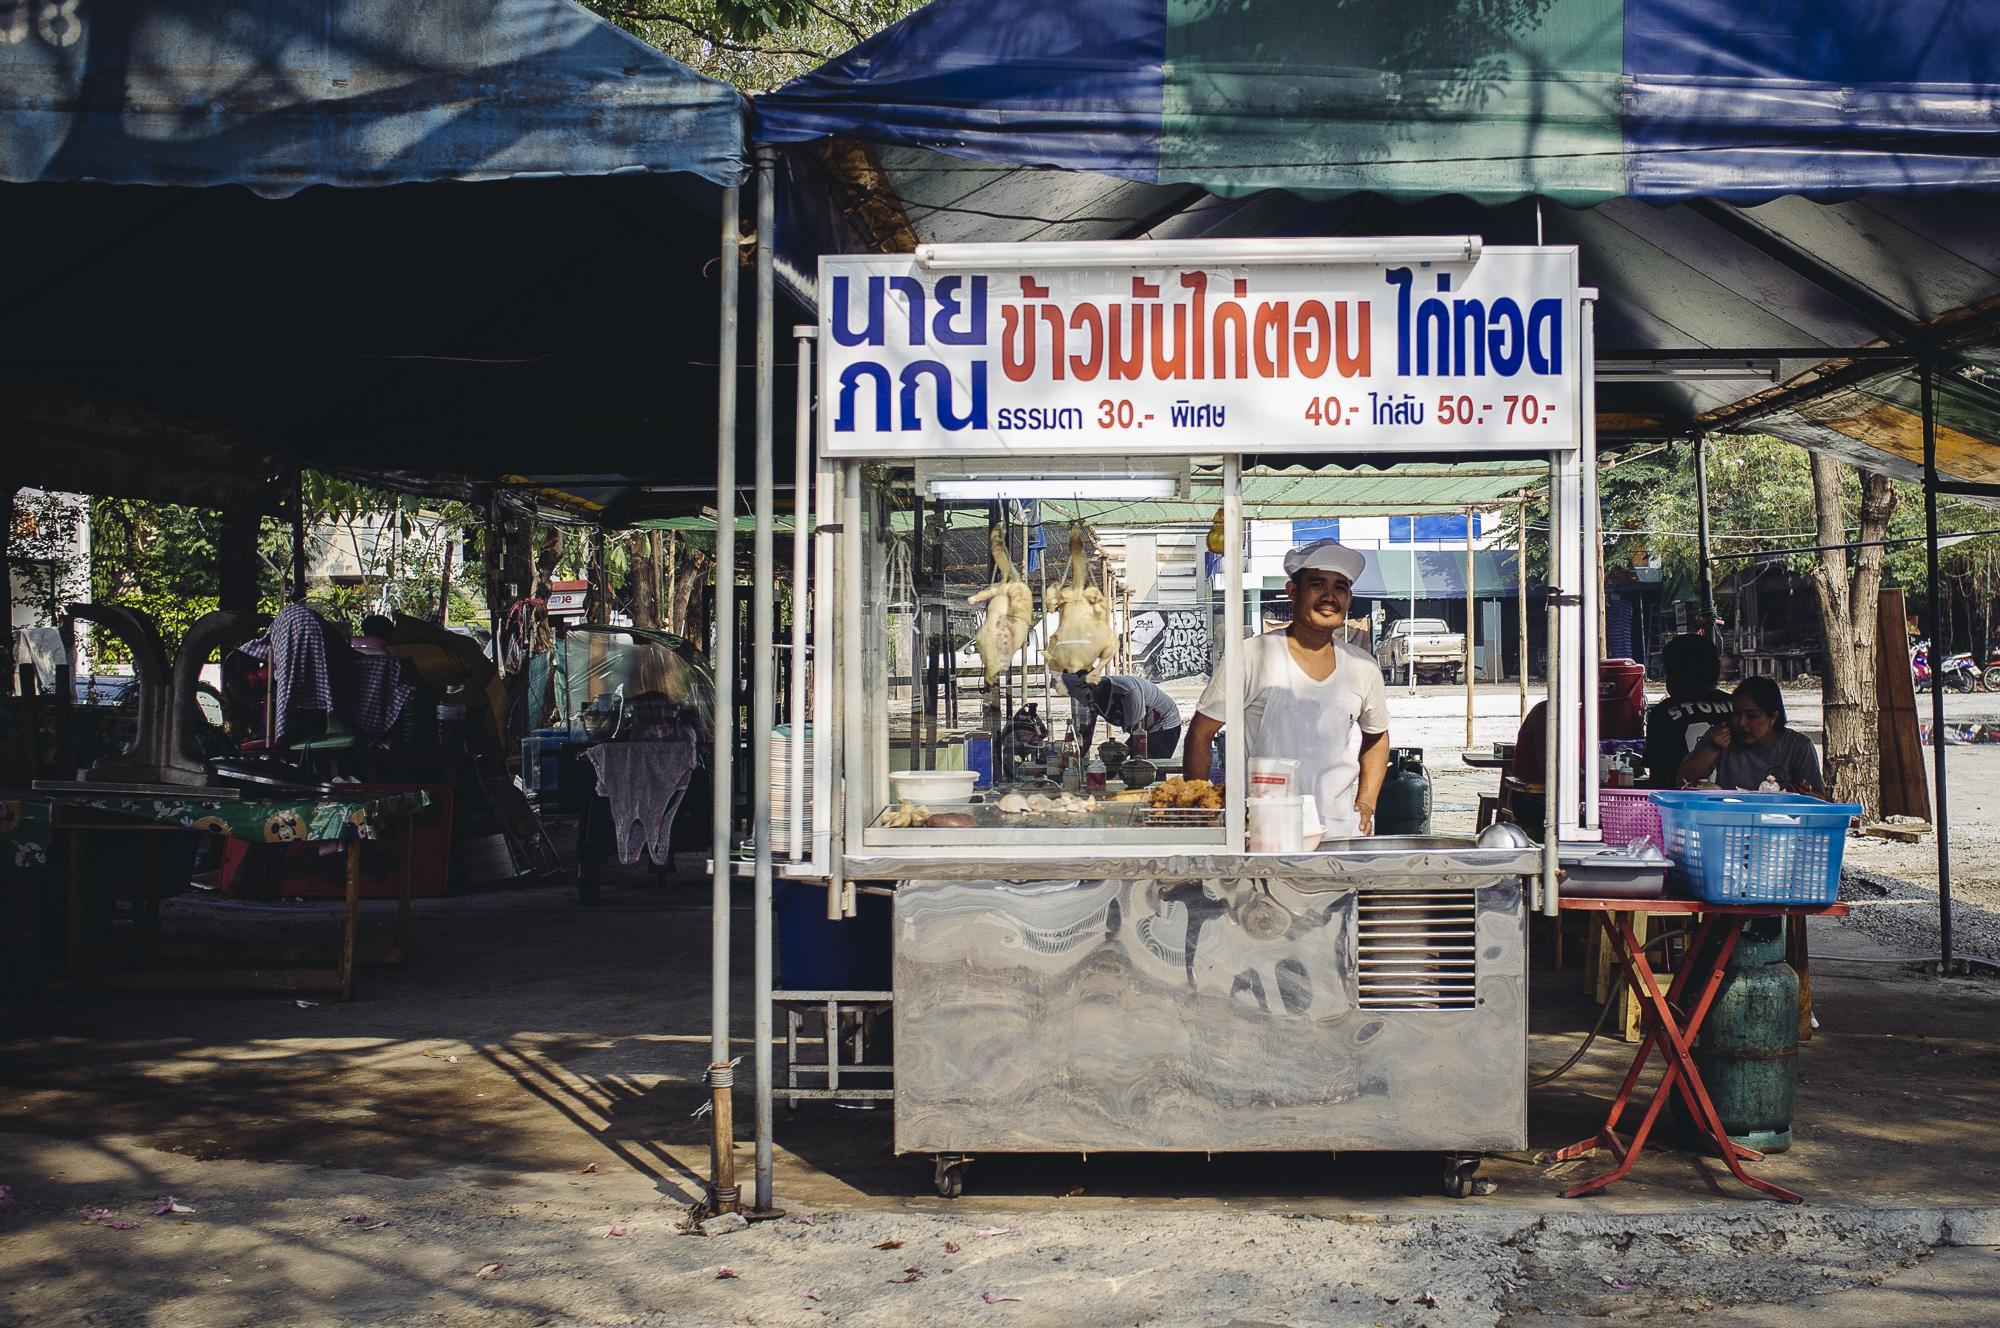 Khao Man Gai ข้าวมันไก่